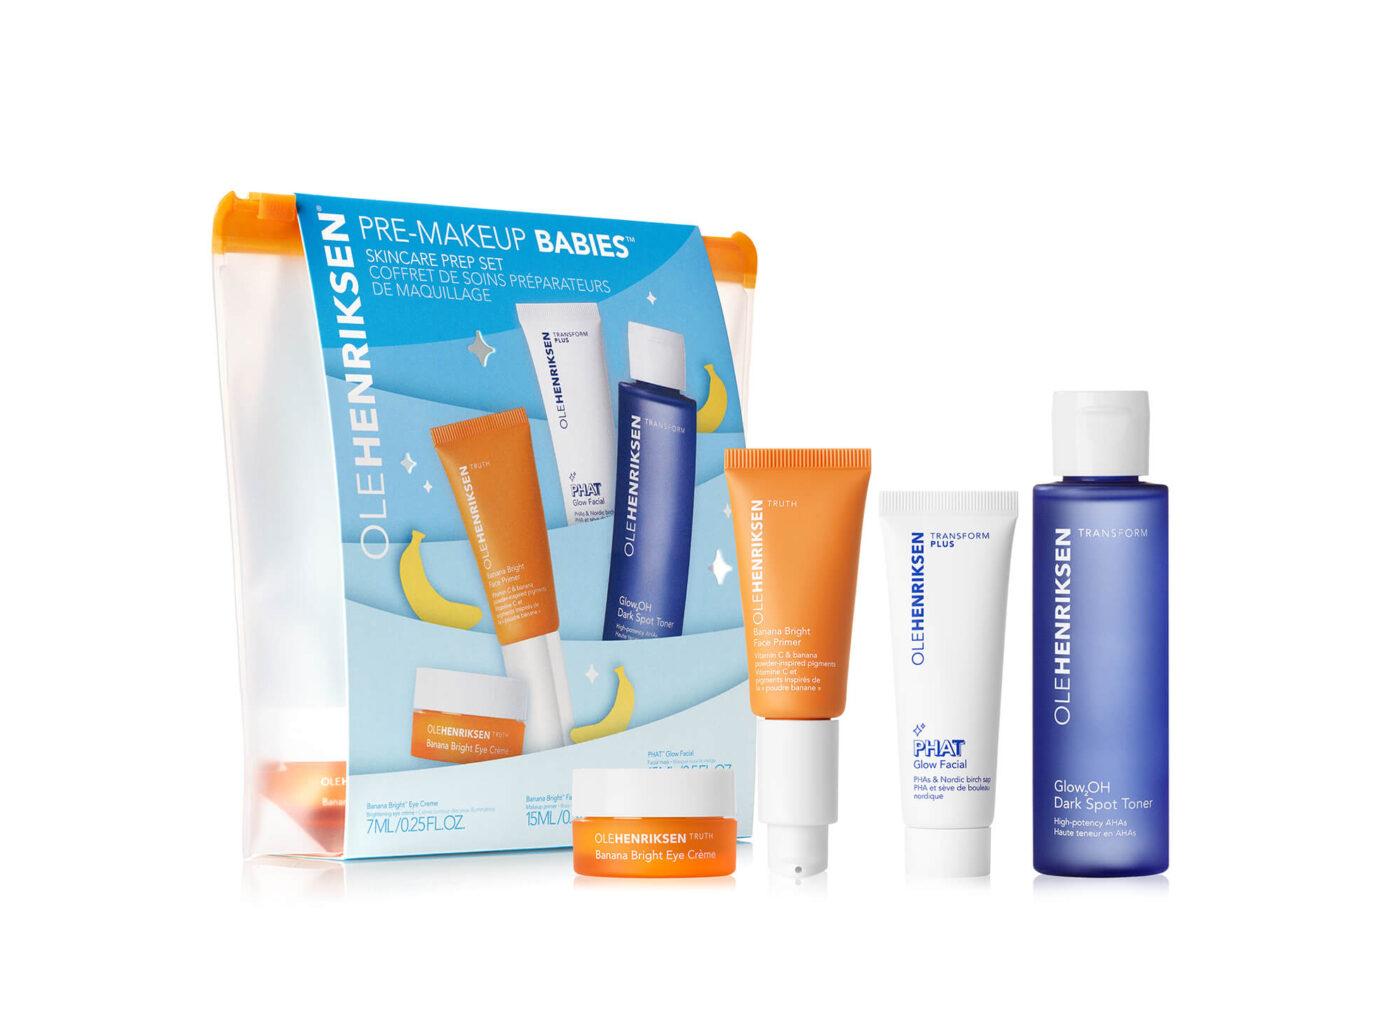 OLEHENRIKSEN Pre-Makeup Babies™ Skincare Prep Set